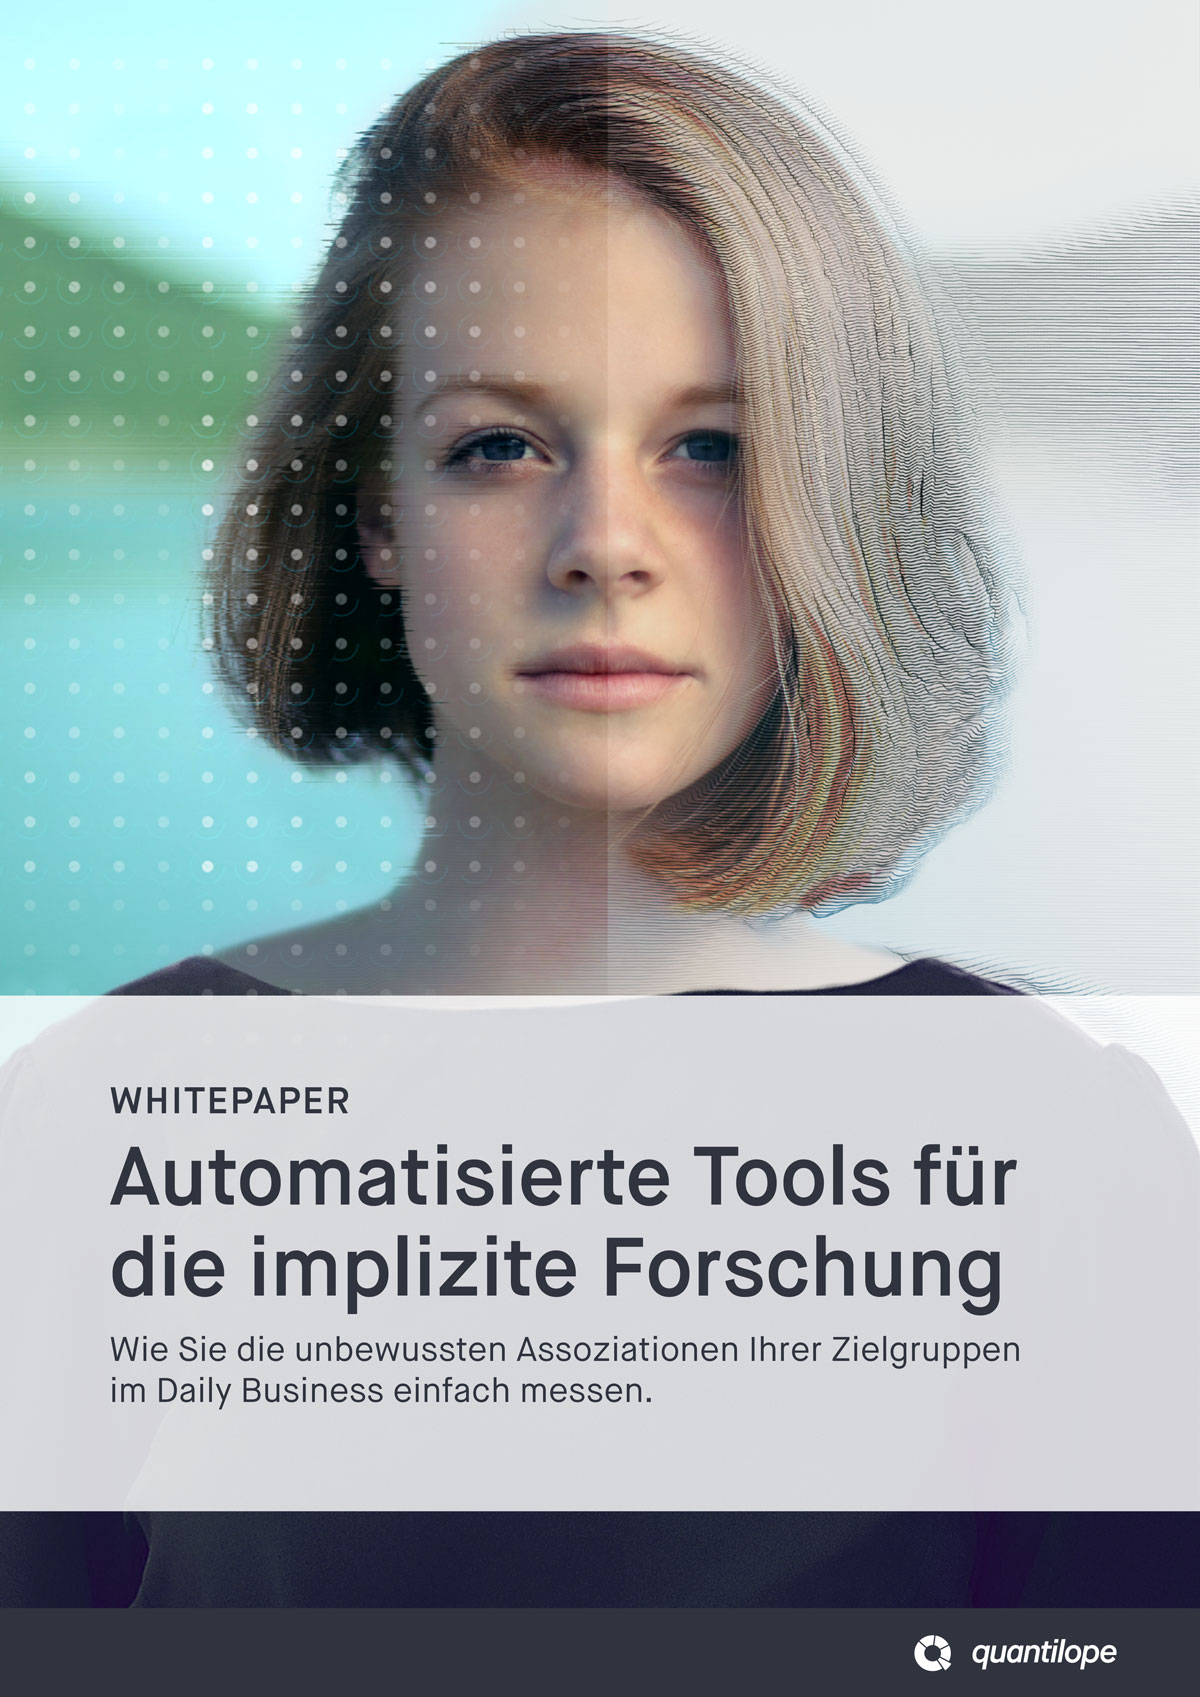 Cover_Automatisierte_implizite_Forschung_2019